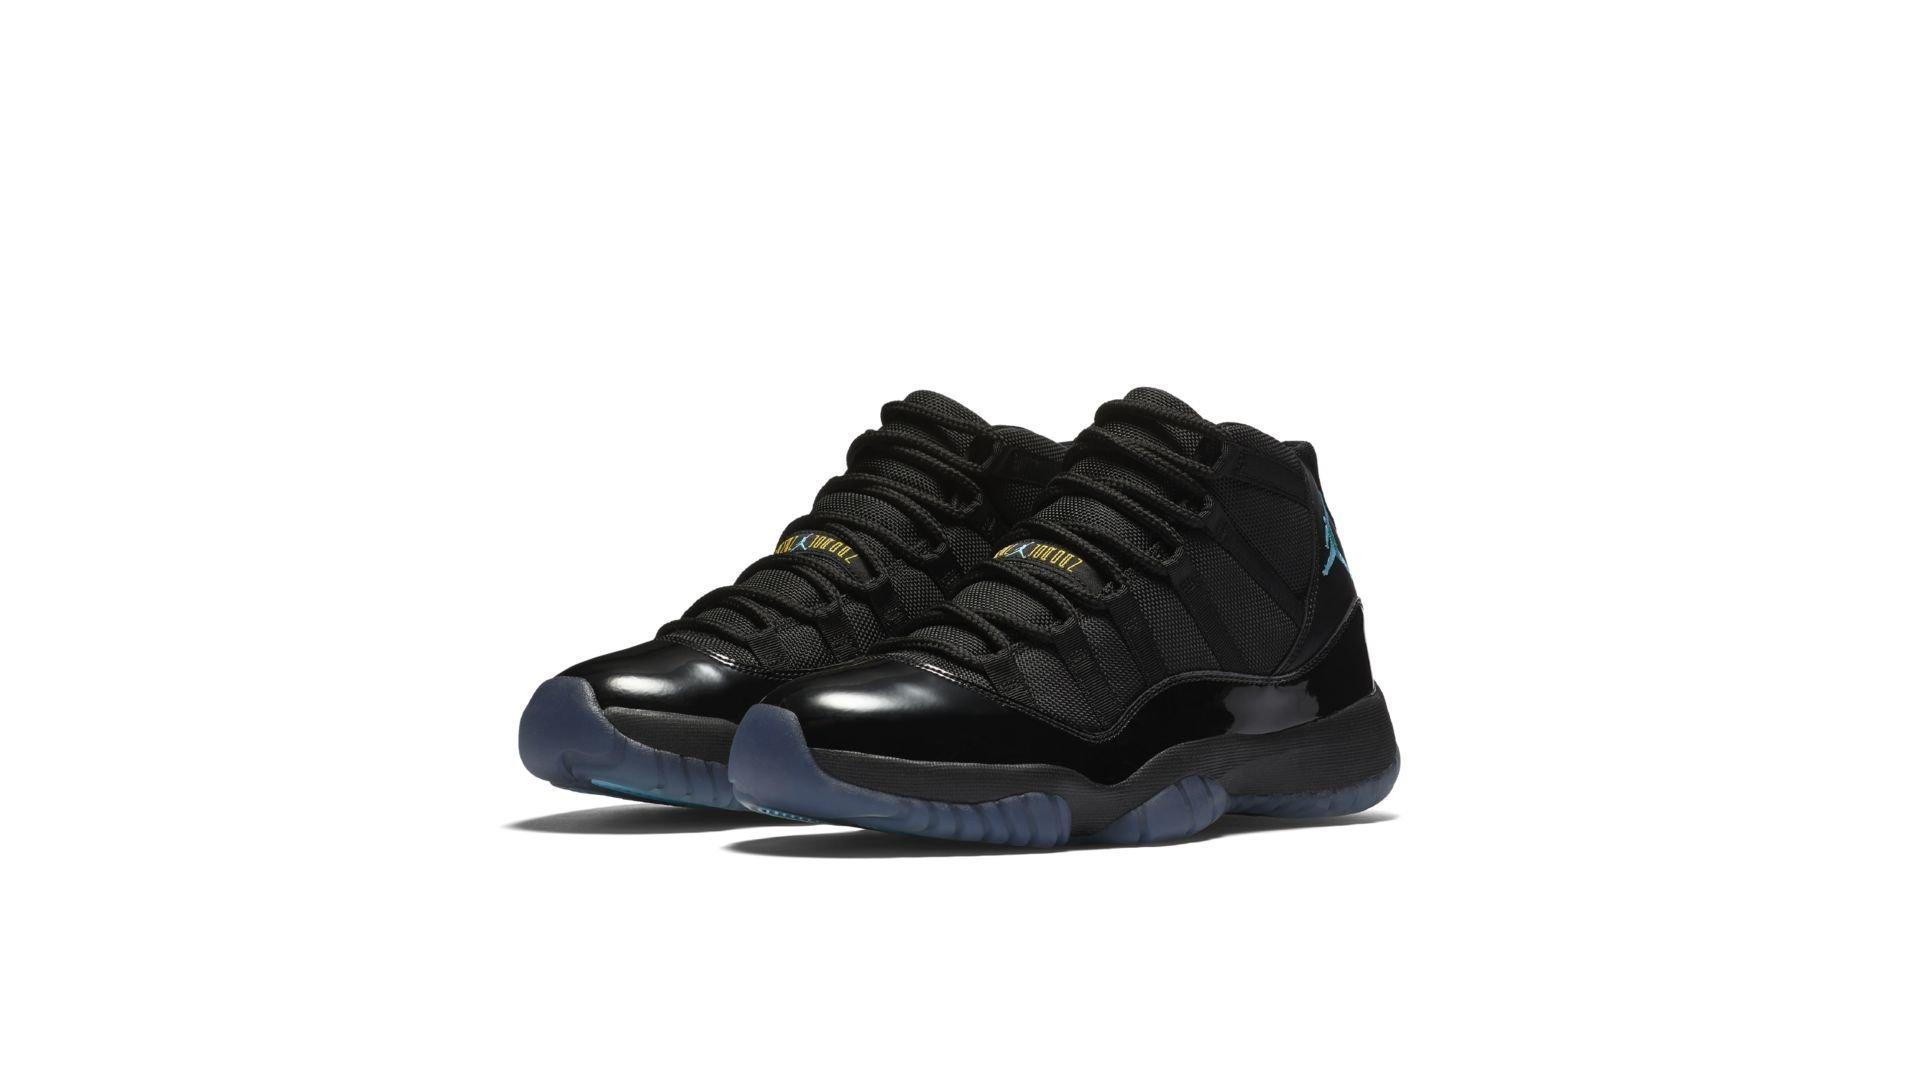 Jordan 11 Retro Gamma Blue (378037-006)